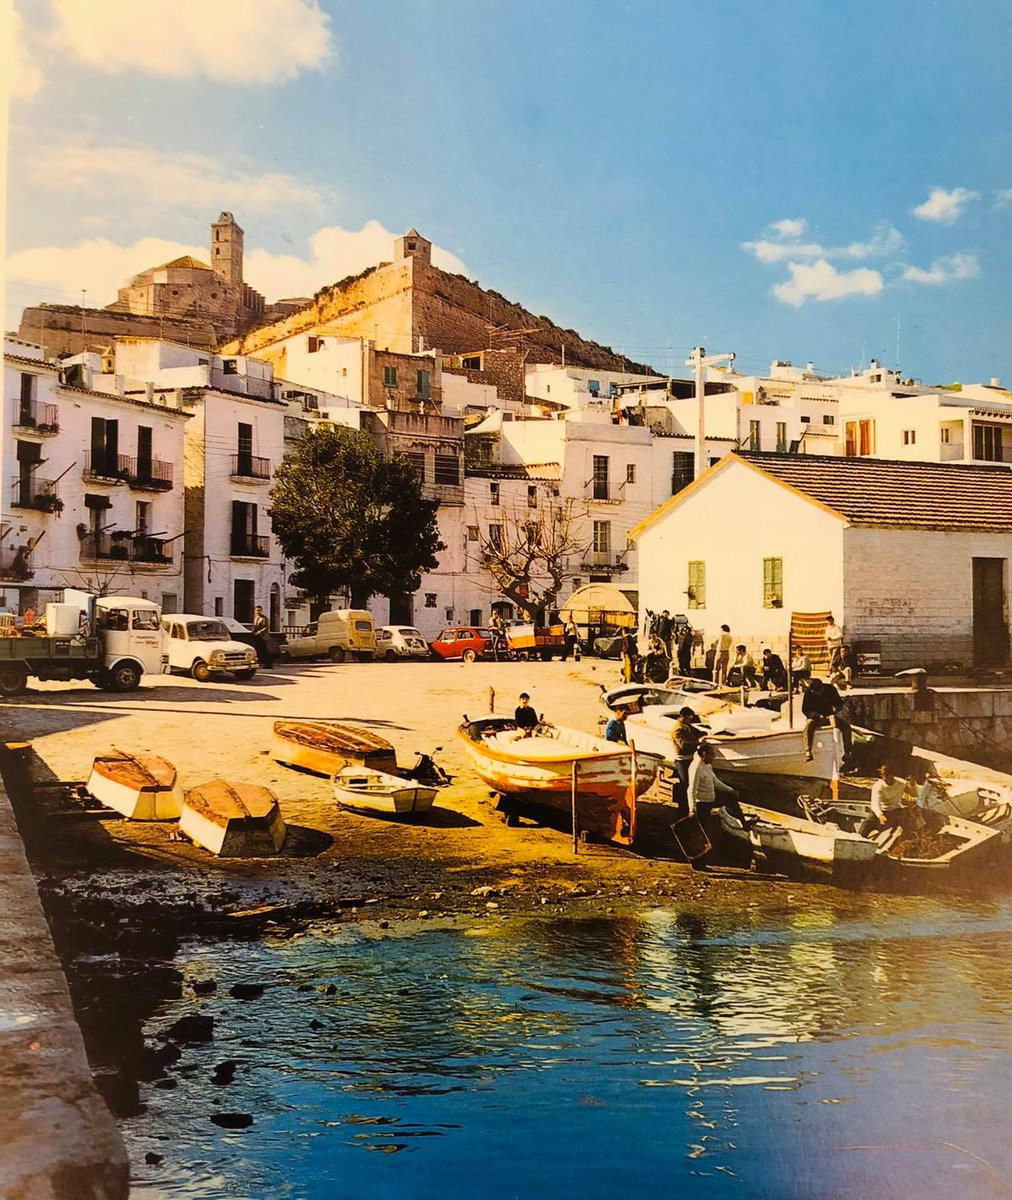 Ibiza 1974😍 #ibiza #daltvilla https://t.co/LGkNFSXxlj